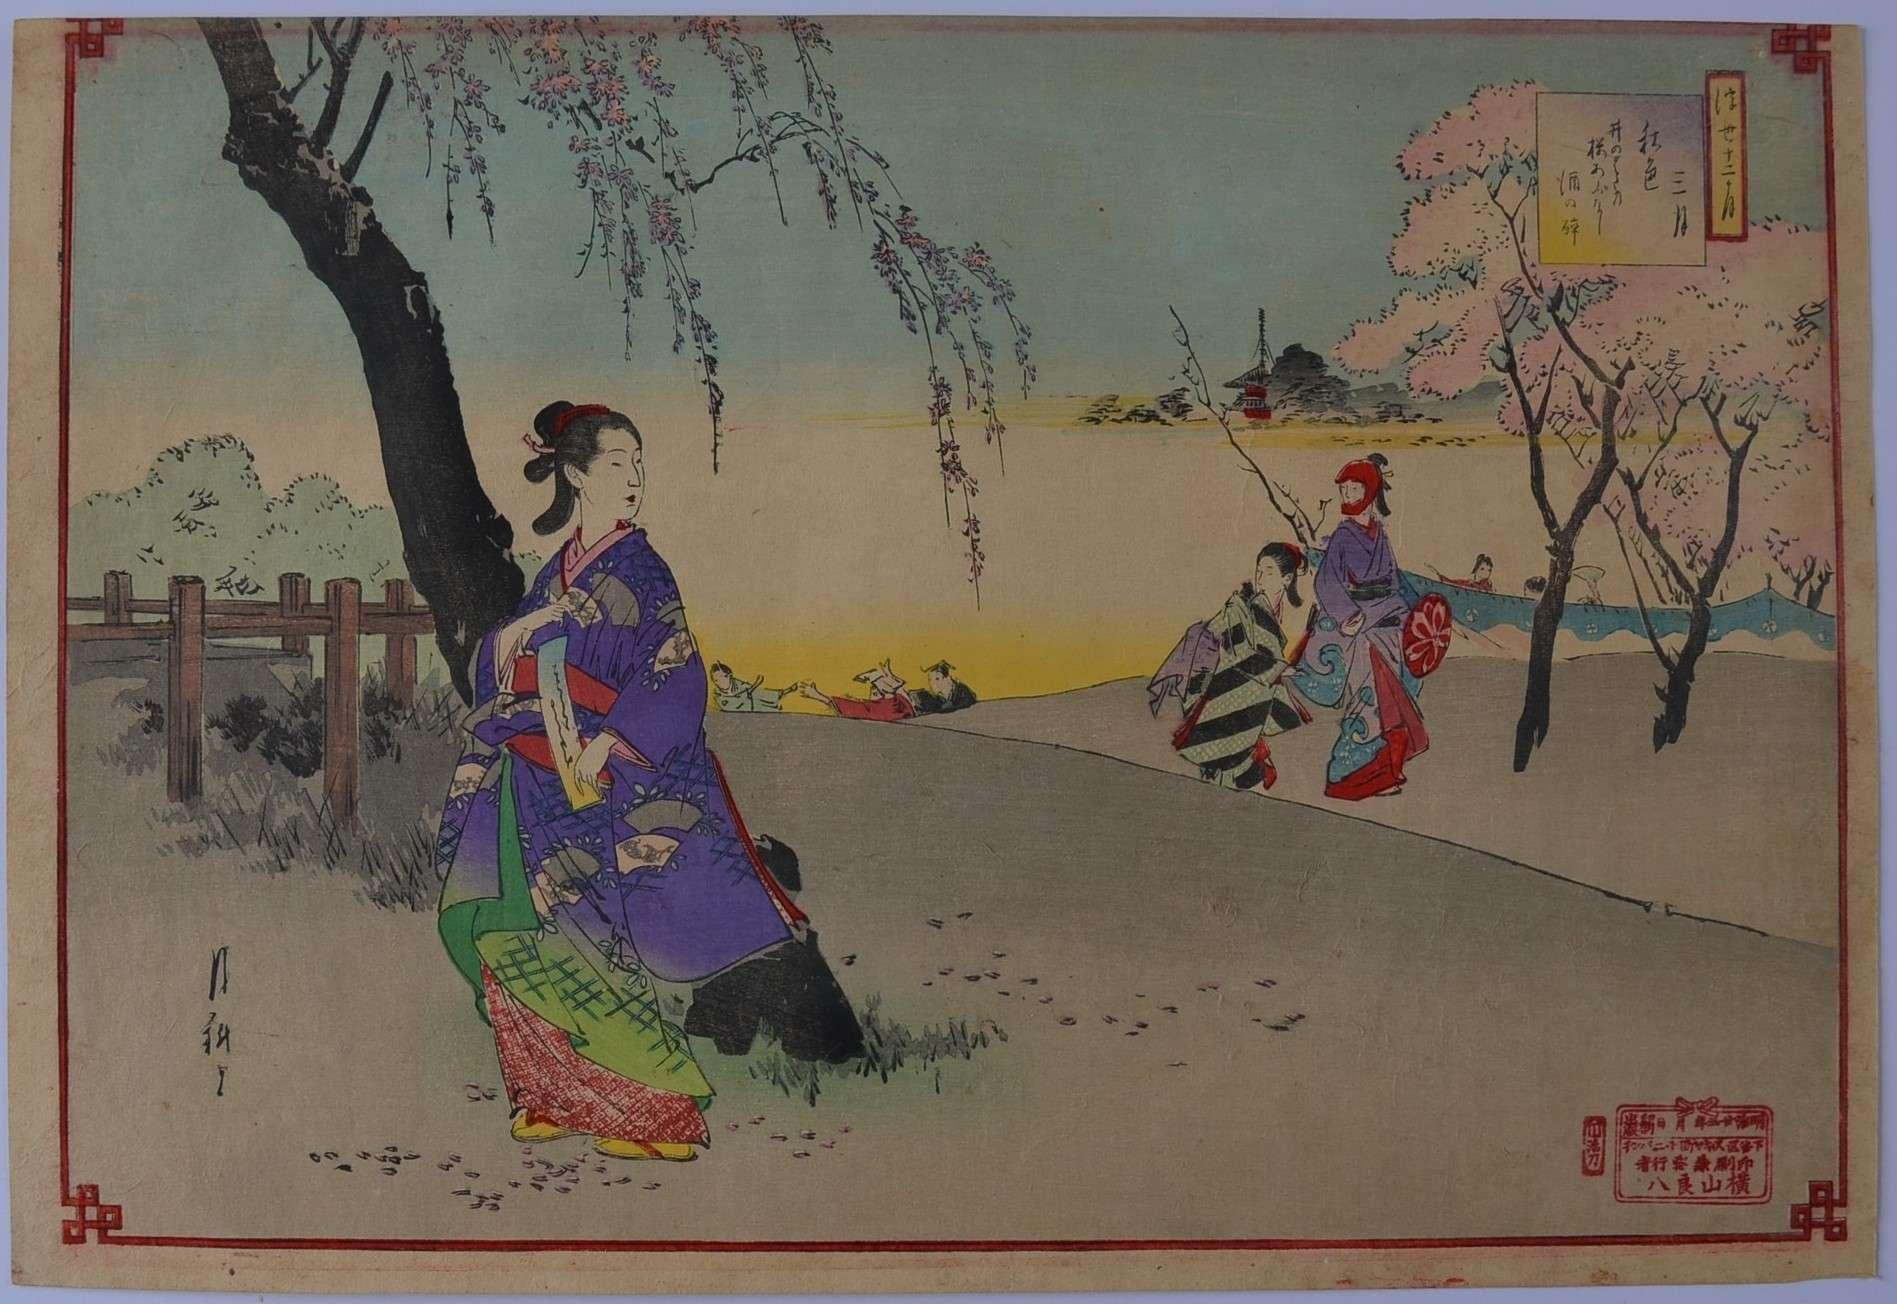 GEKKO OGATA: #P2269 FROM THE SERIES JUNIKAGETSU - TWELVE MONTHS OF UKIYO (1890)